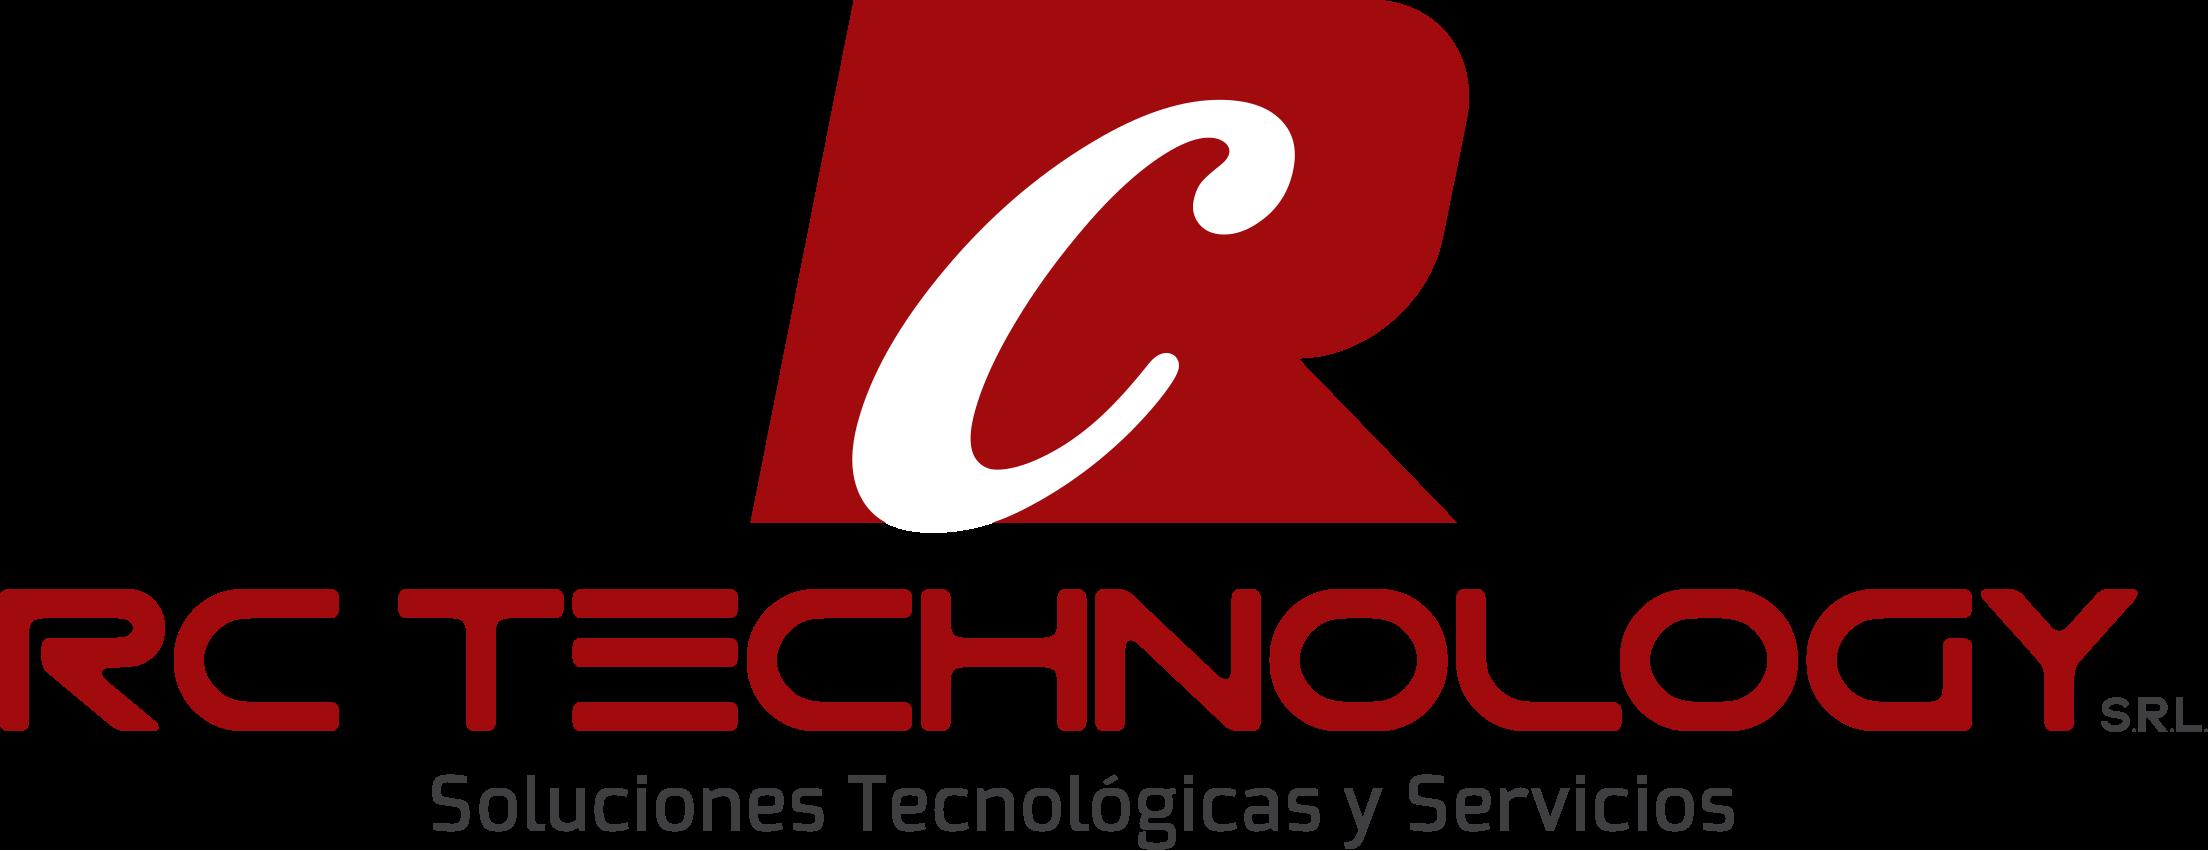 RC Technology, SRL